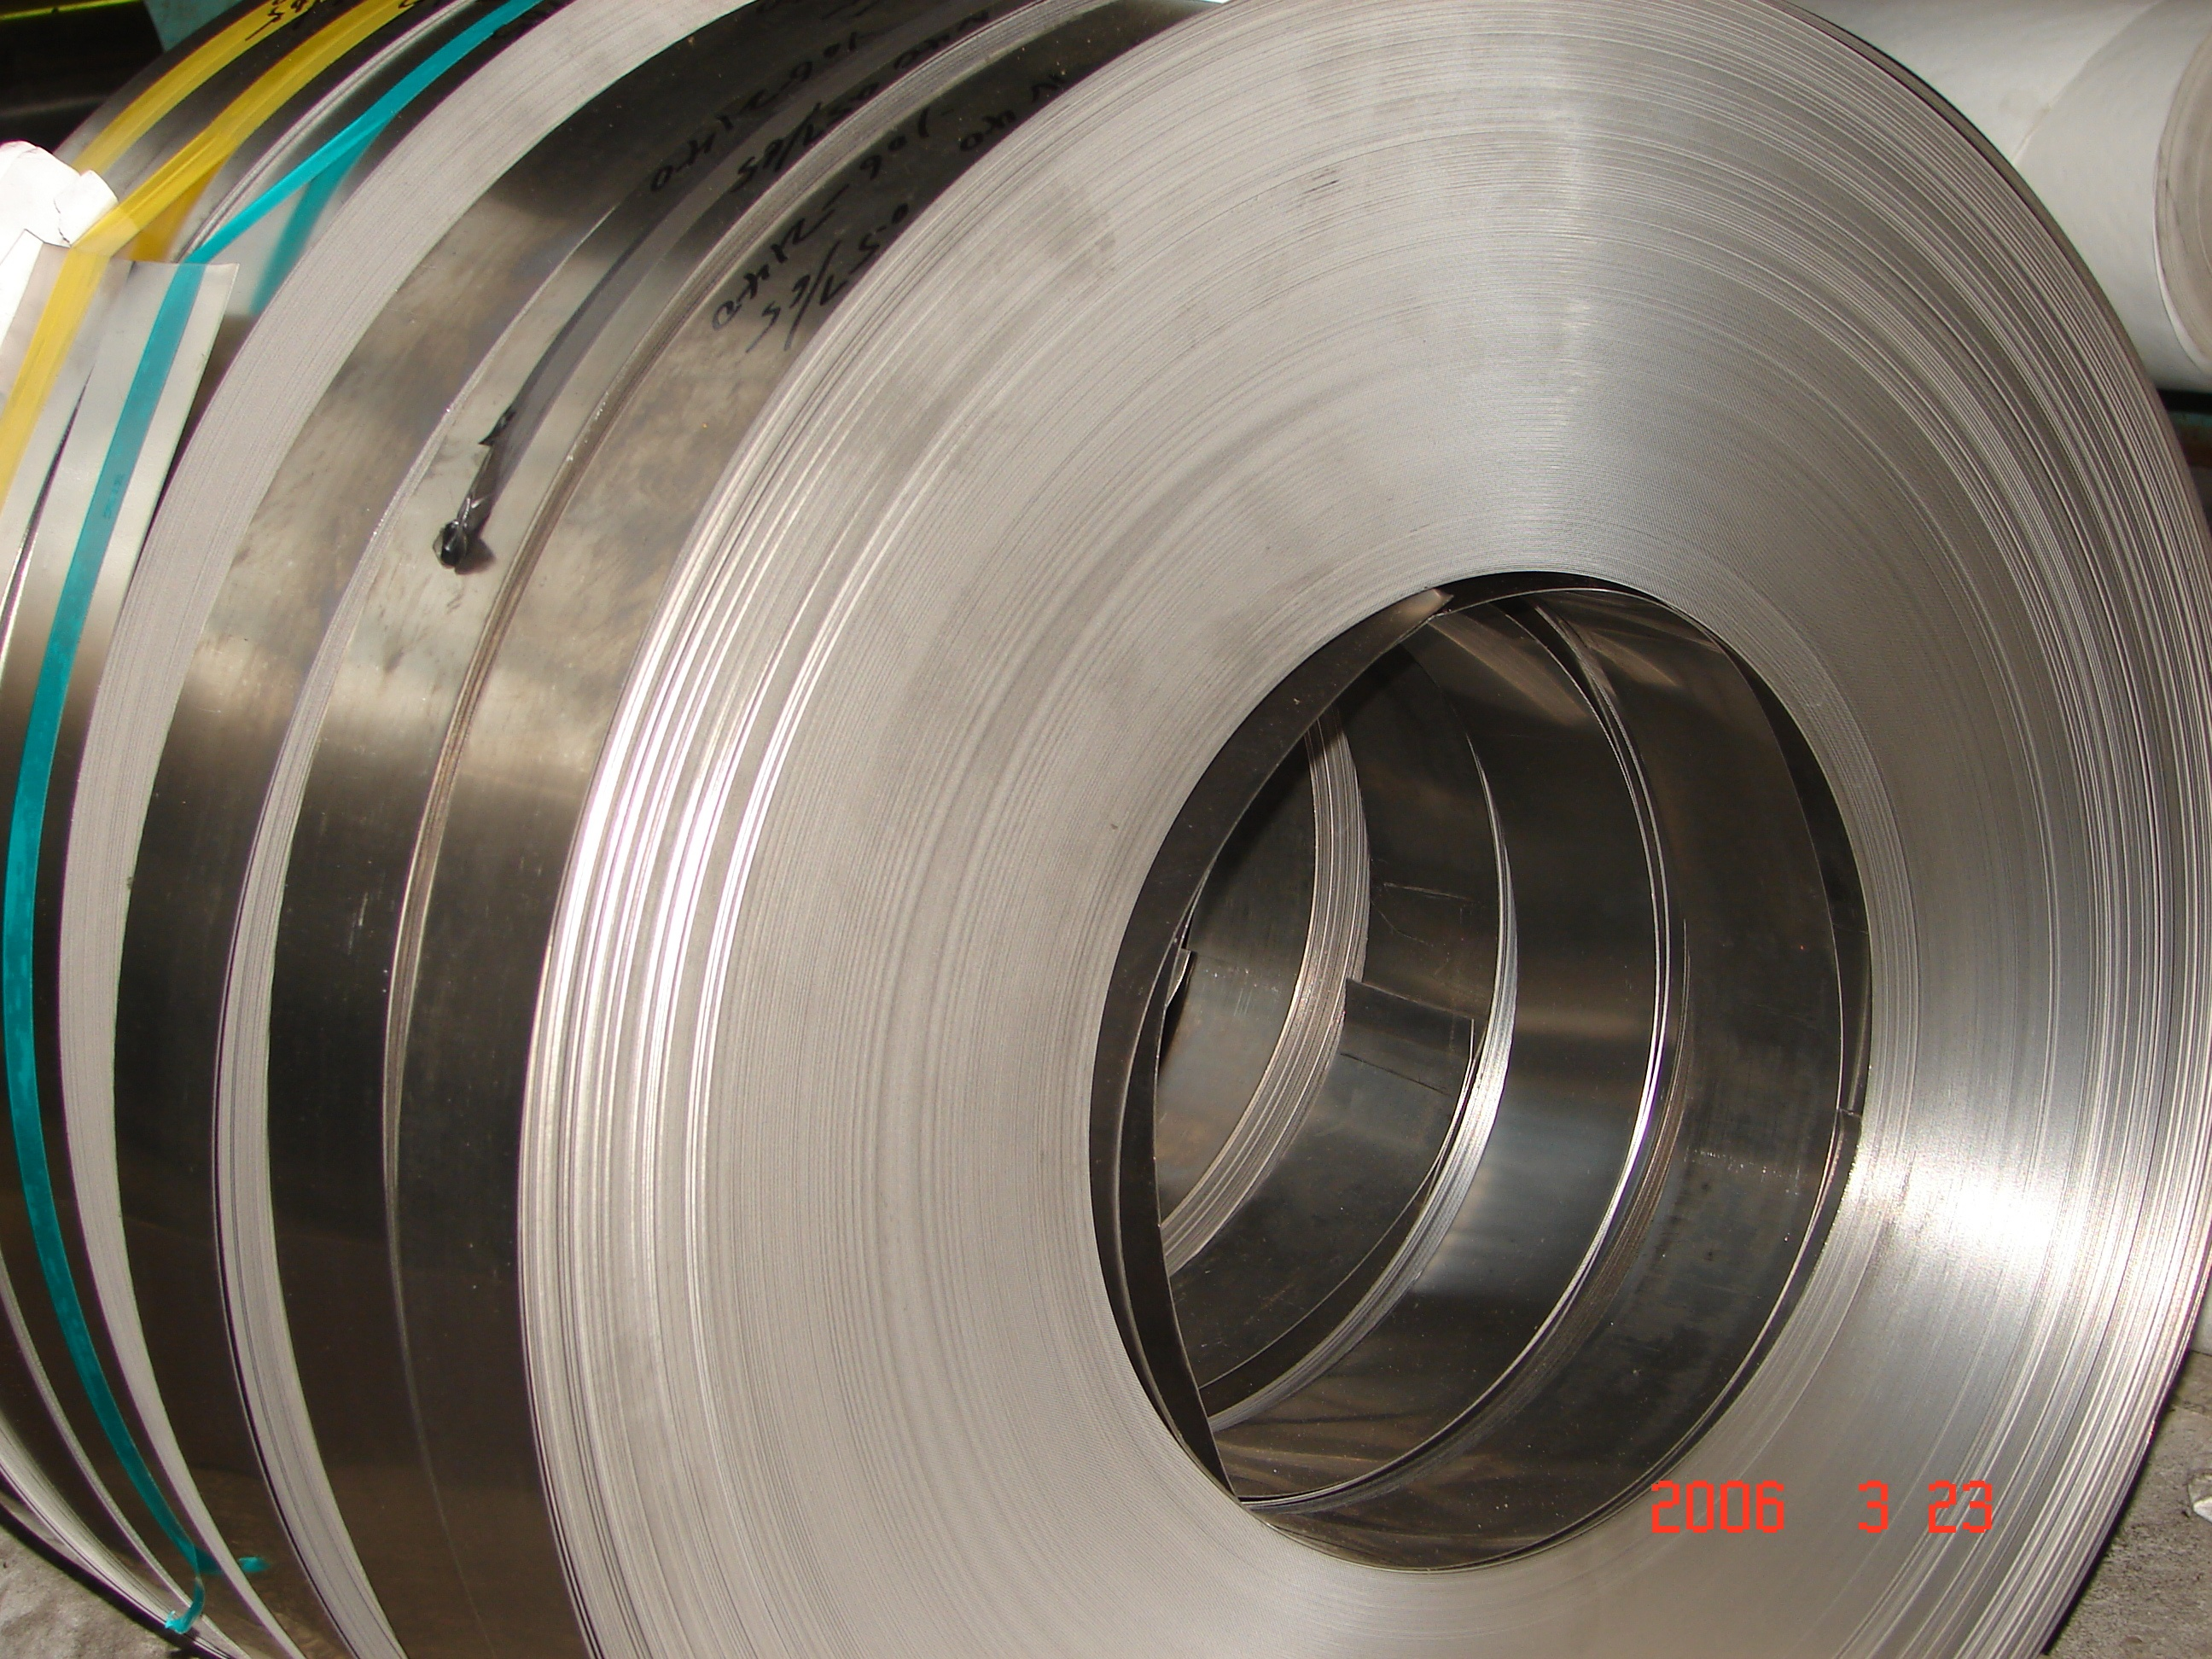 permalloy soft magnetic strips 1J50 1J79 1J77 1J85